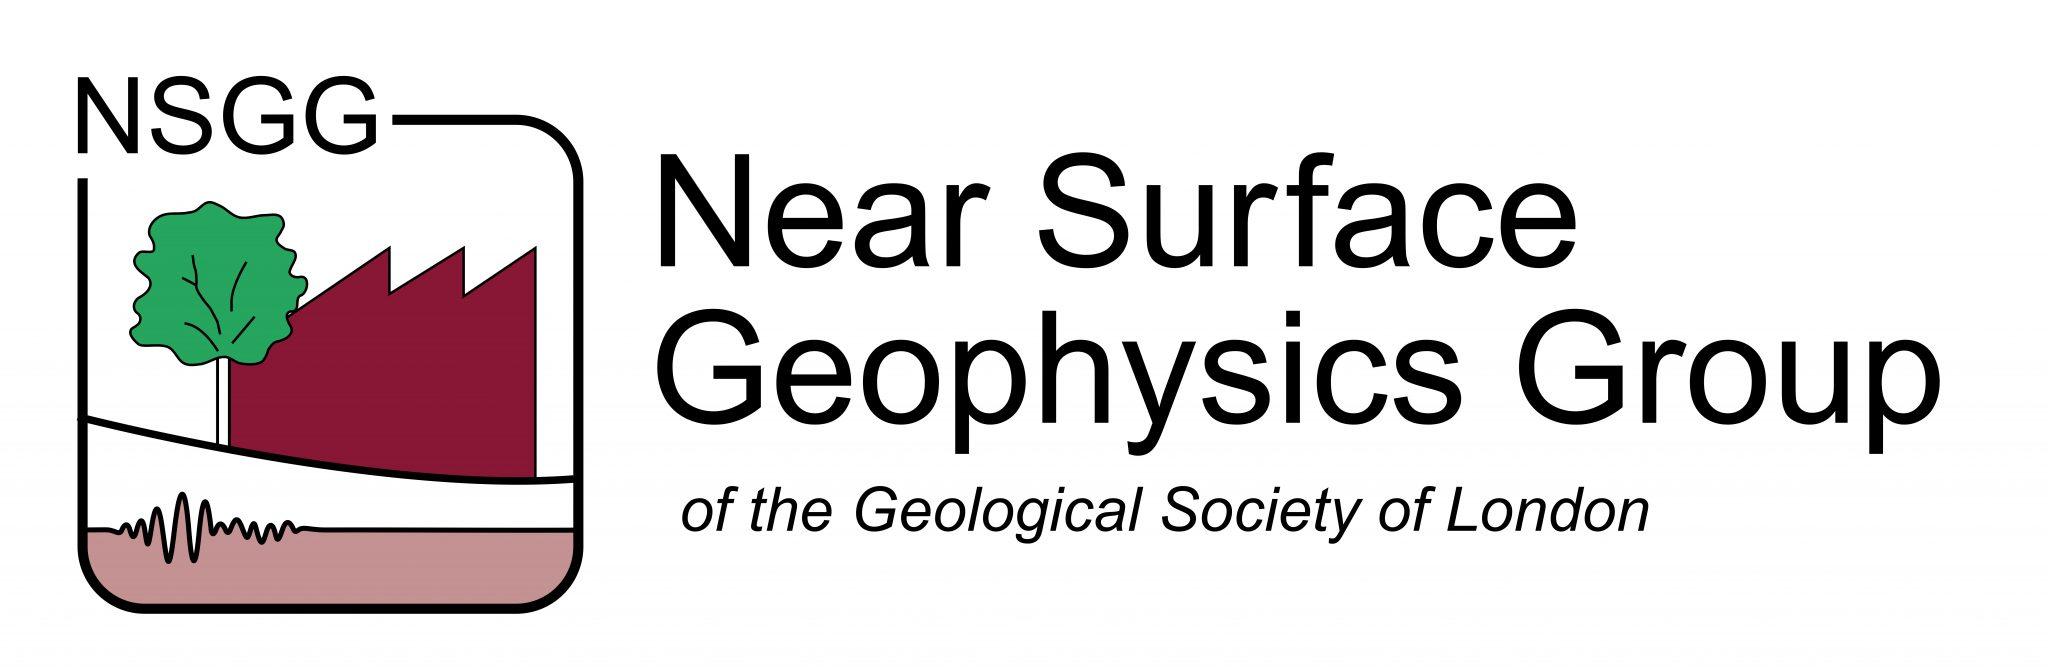 Near Surface Geophysics Group